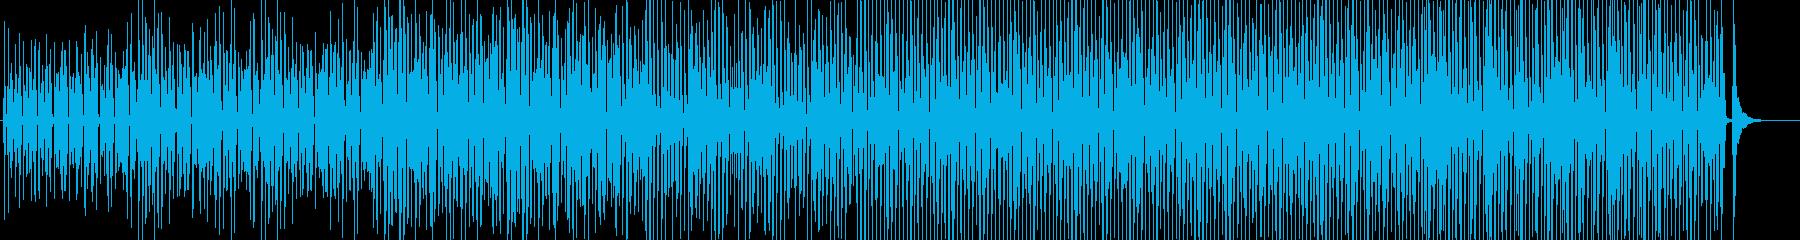 Youtube-日常-ウクレレ-かわいいの再生済みの波形